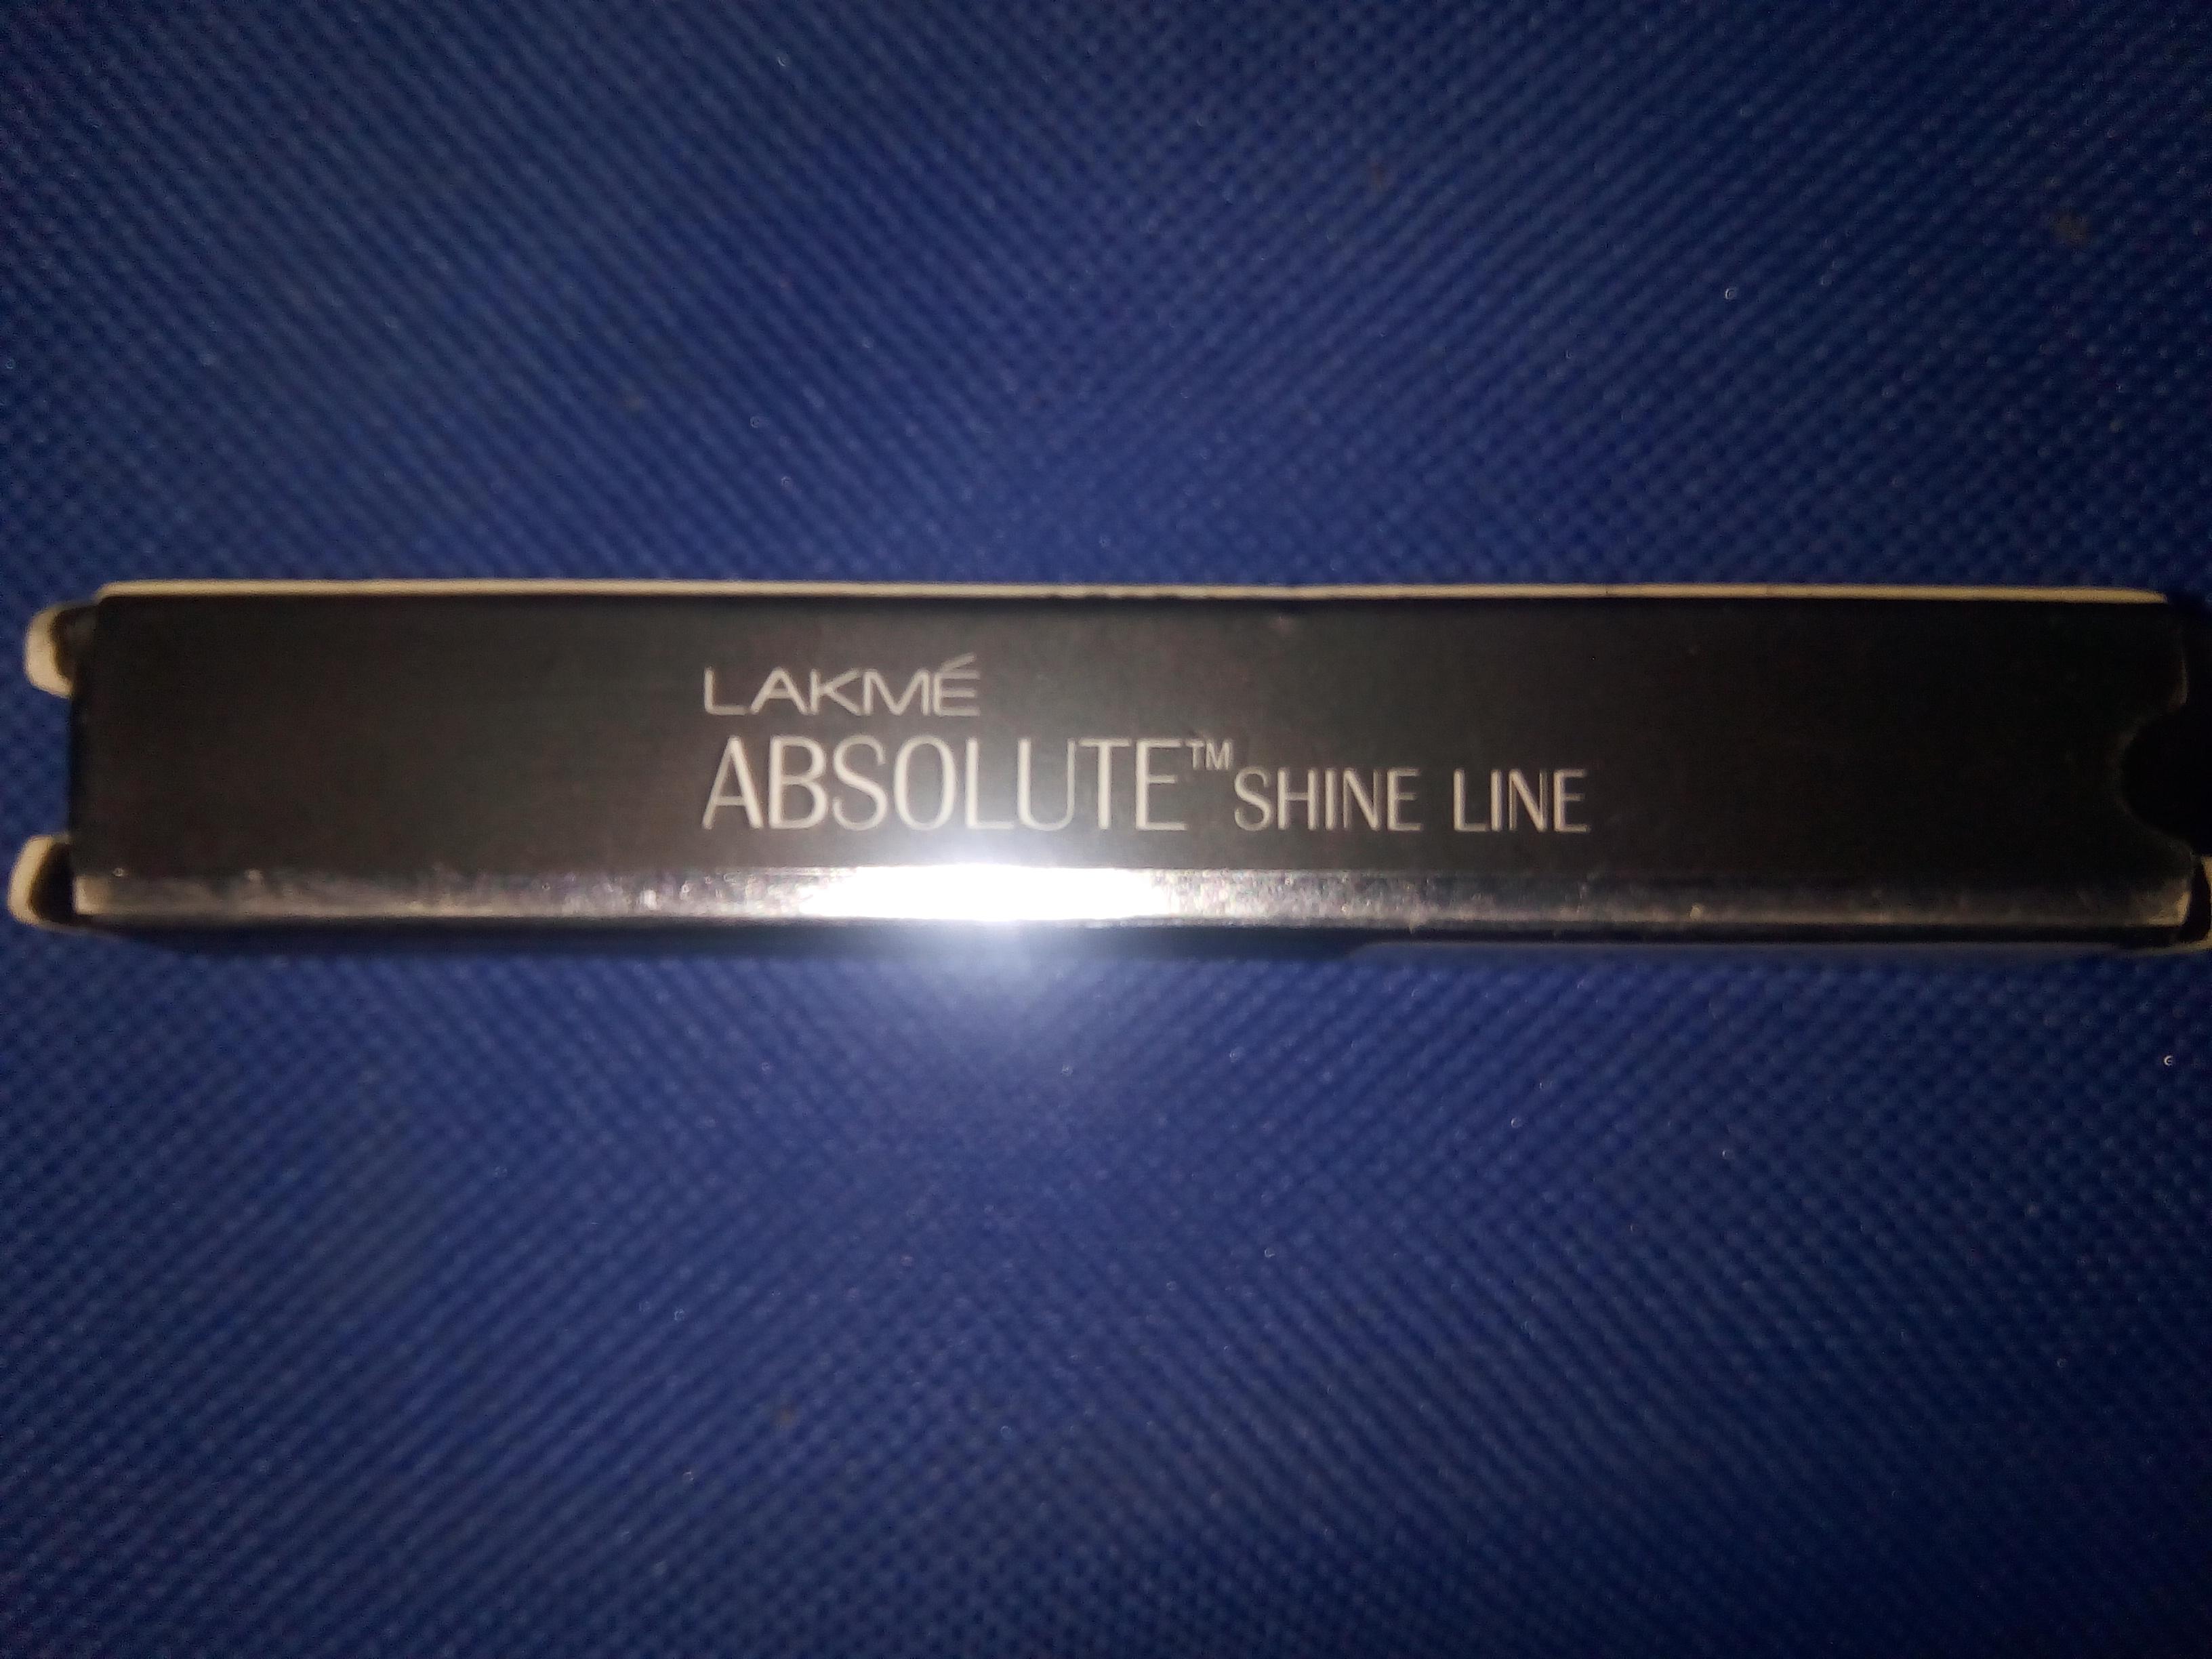 Lakme Absolute Shine Liquid Eyeliner-Lakme Absolute Shine Liquid Eyeliner-By aflyingsoul